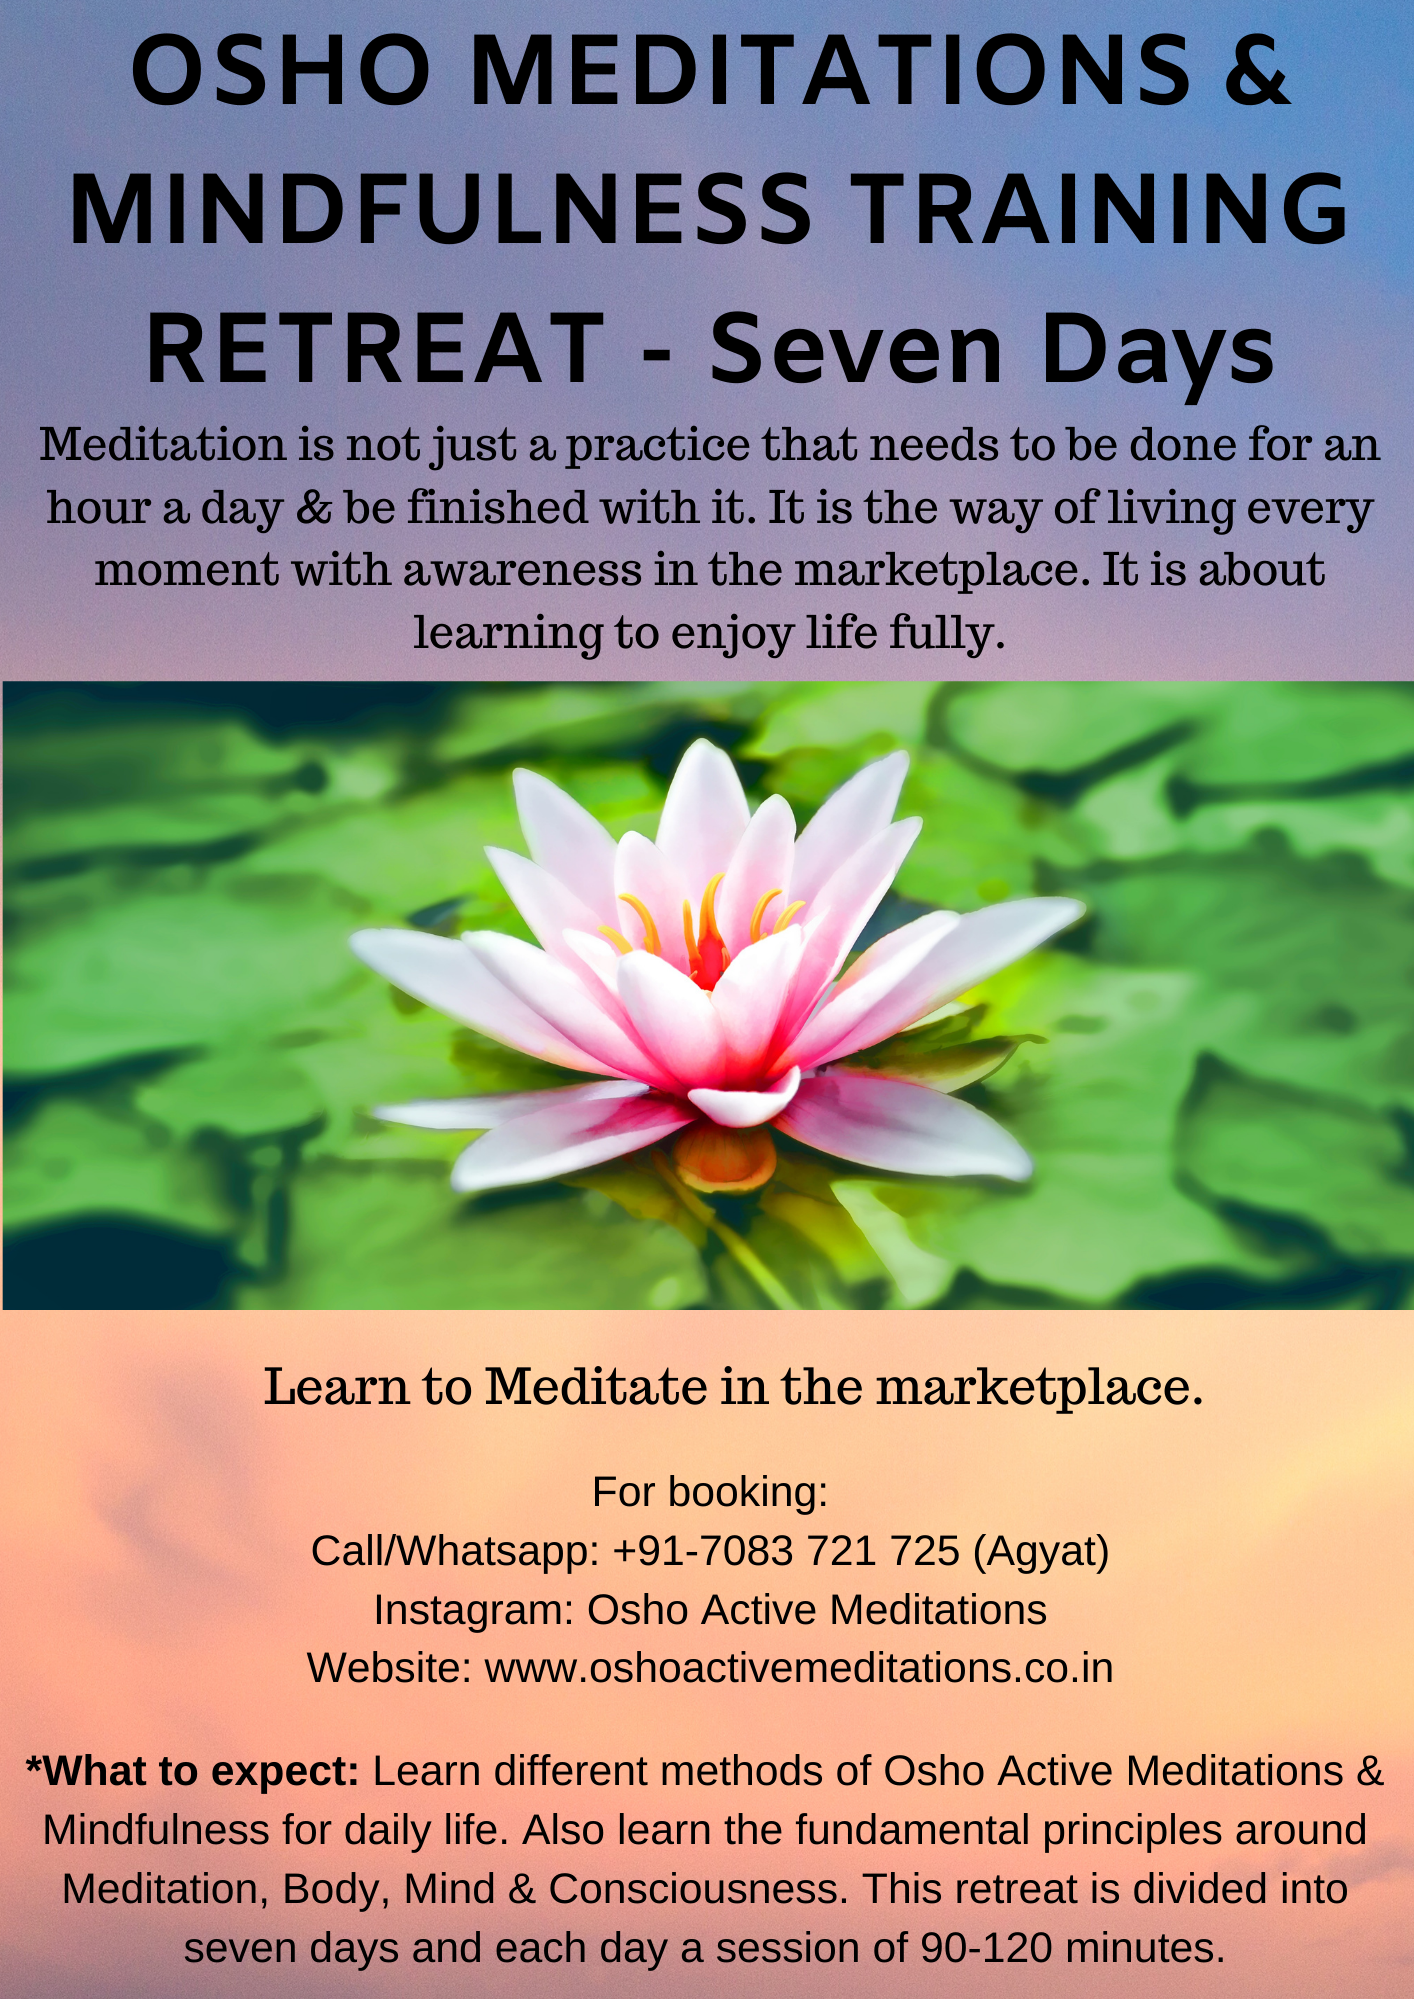 7 days - Osho Meditations & Mindfulness Training Retreat